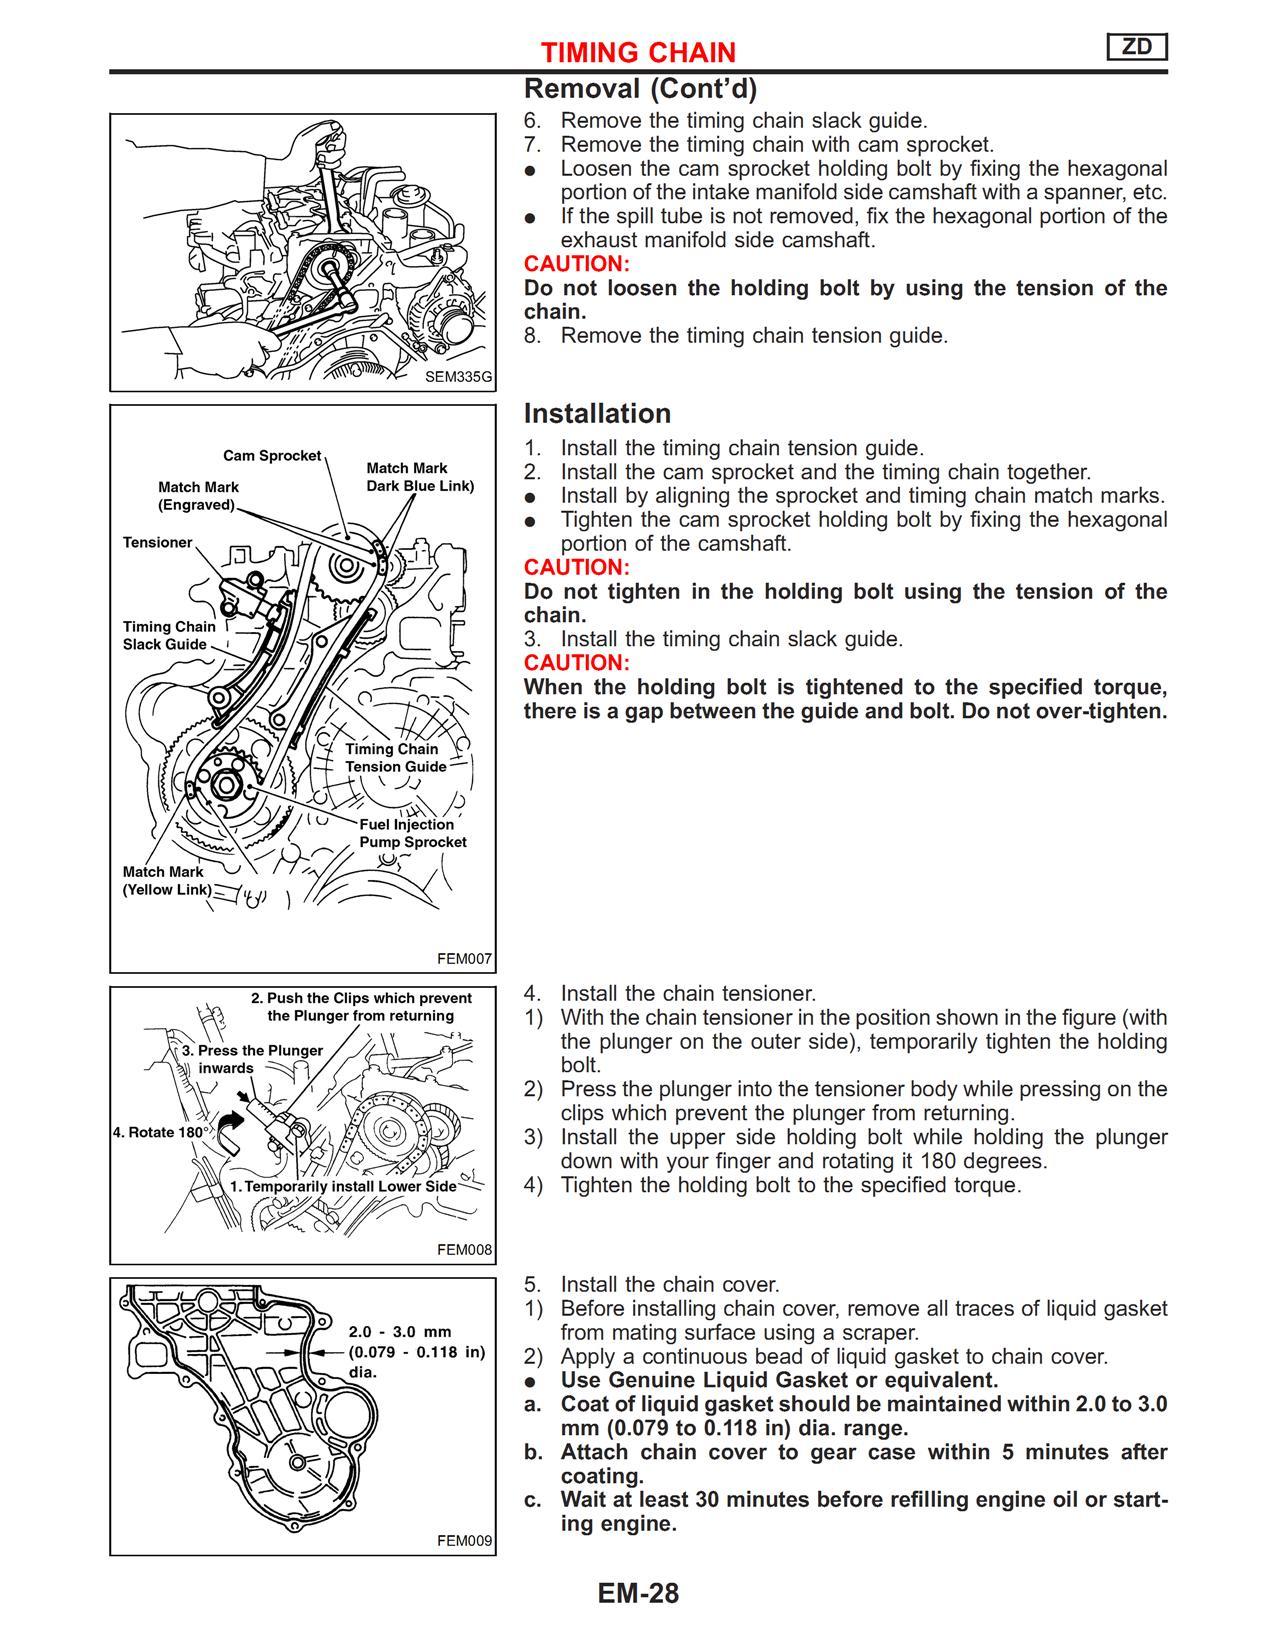 john deere 8650 service manual